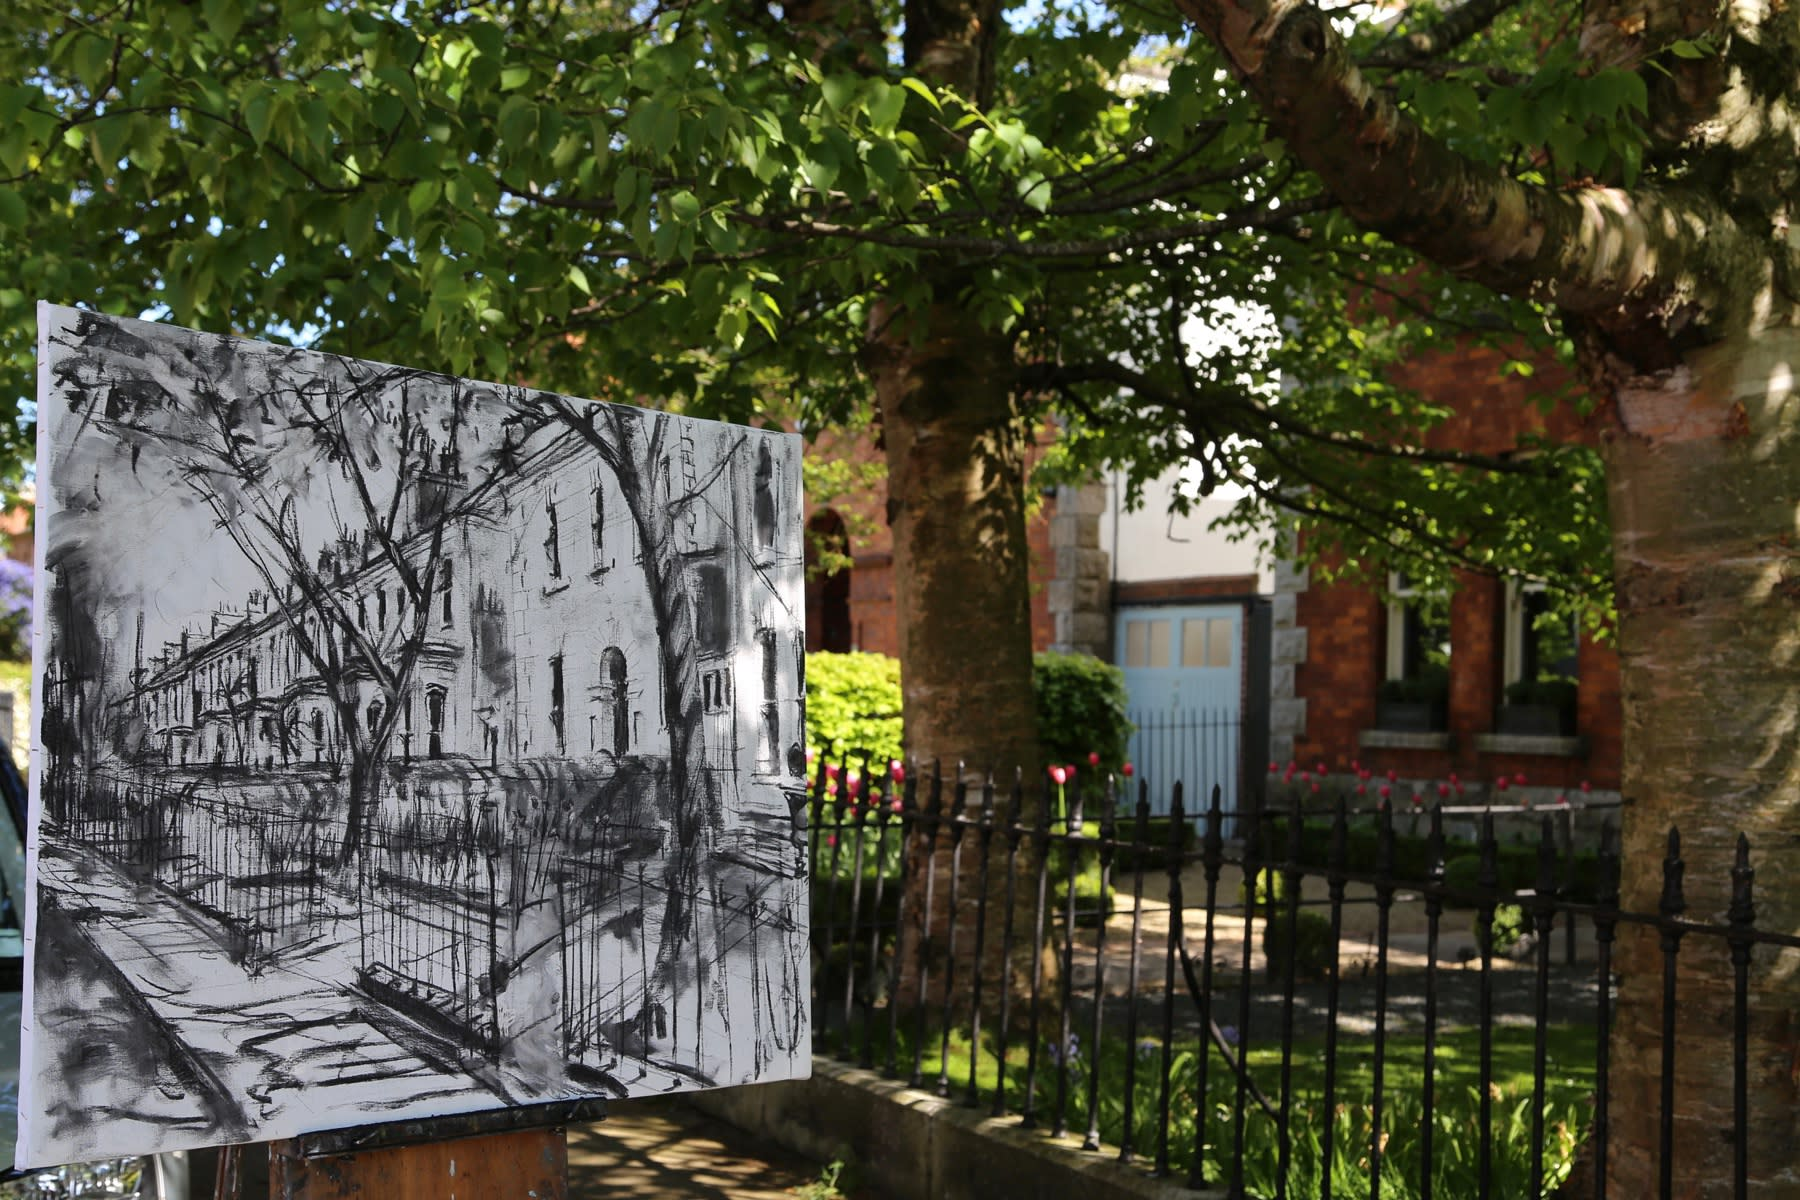 09 MAY 2020 ALBANY ROAD, RANELAGH, DUBLIN Beechwood Serenity, sketch photo: Agata Byrne